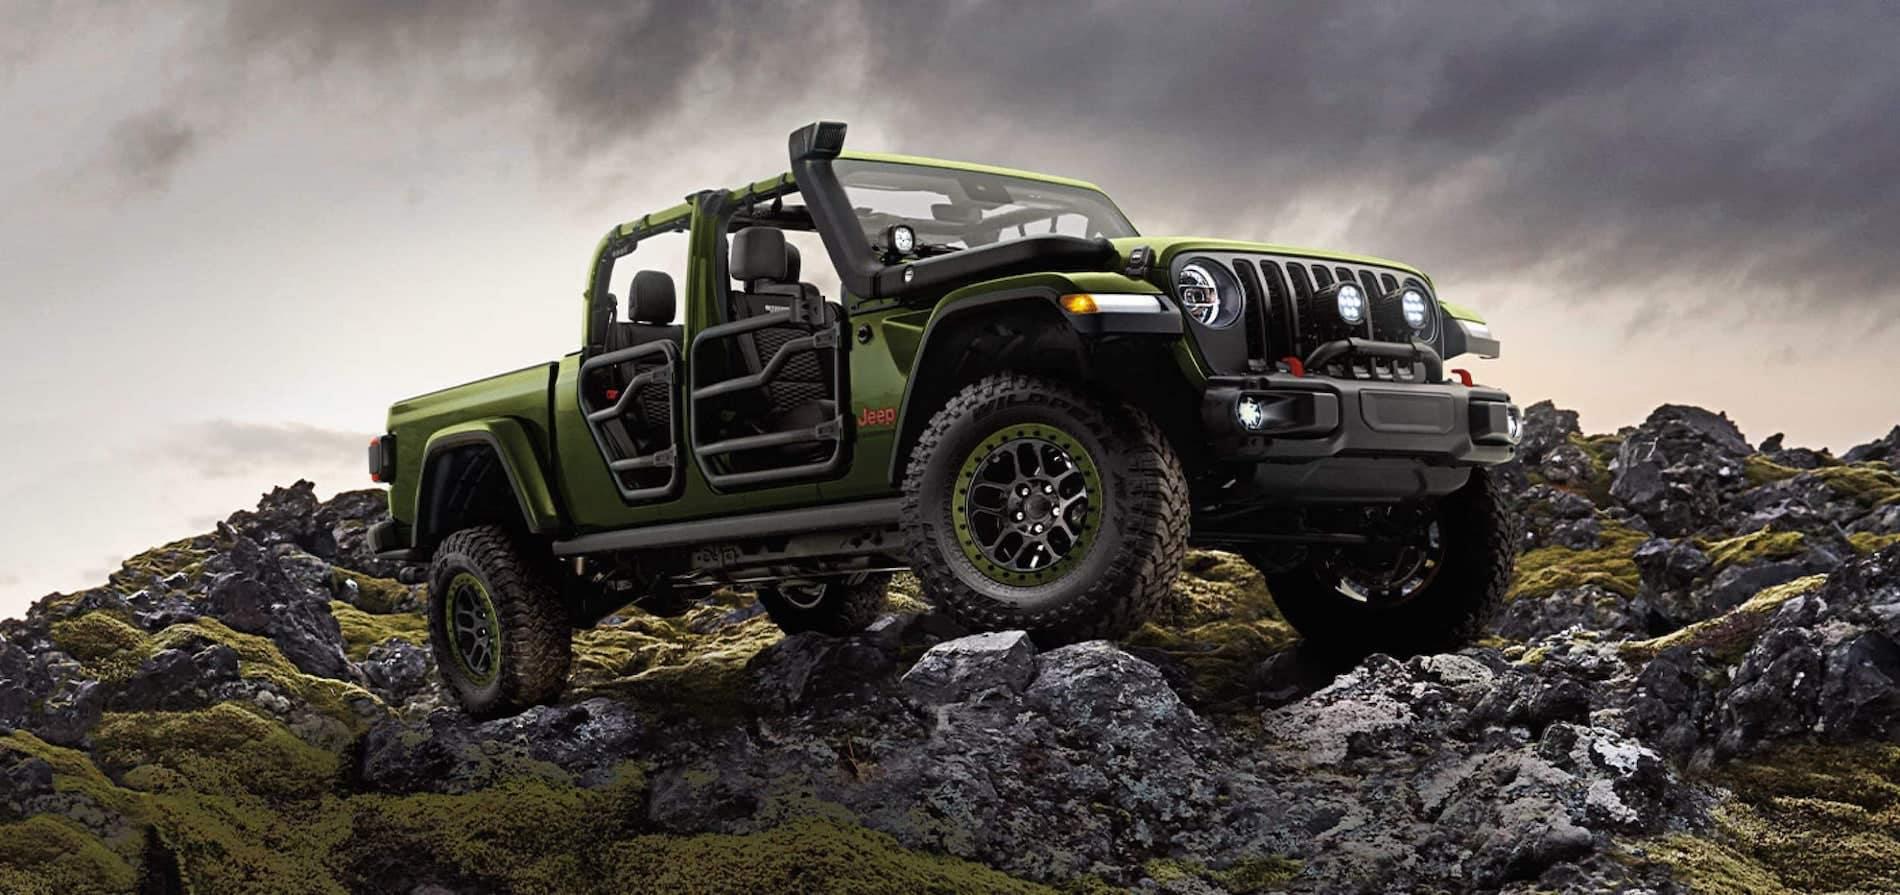 2021 Jeep Gladiator Safety Features Warrenton, VA